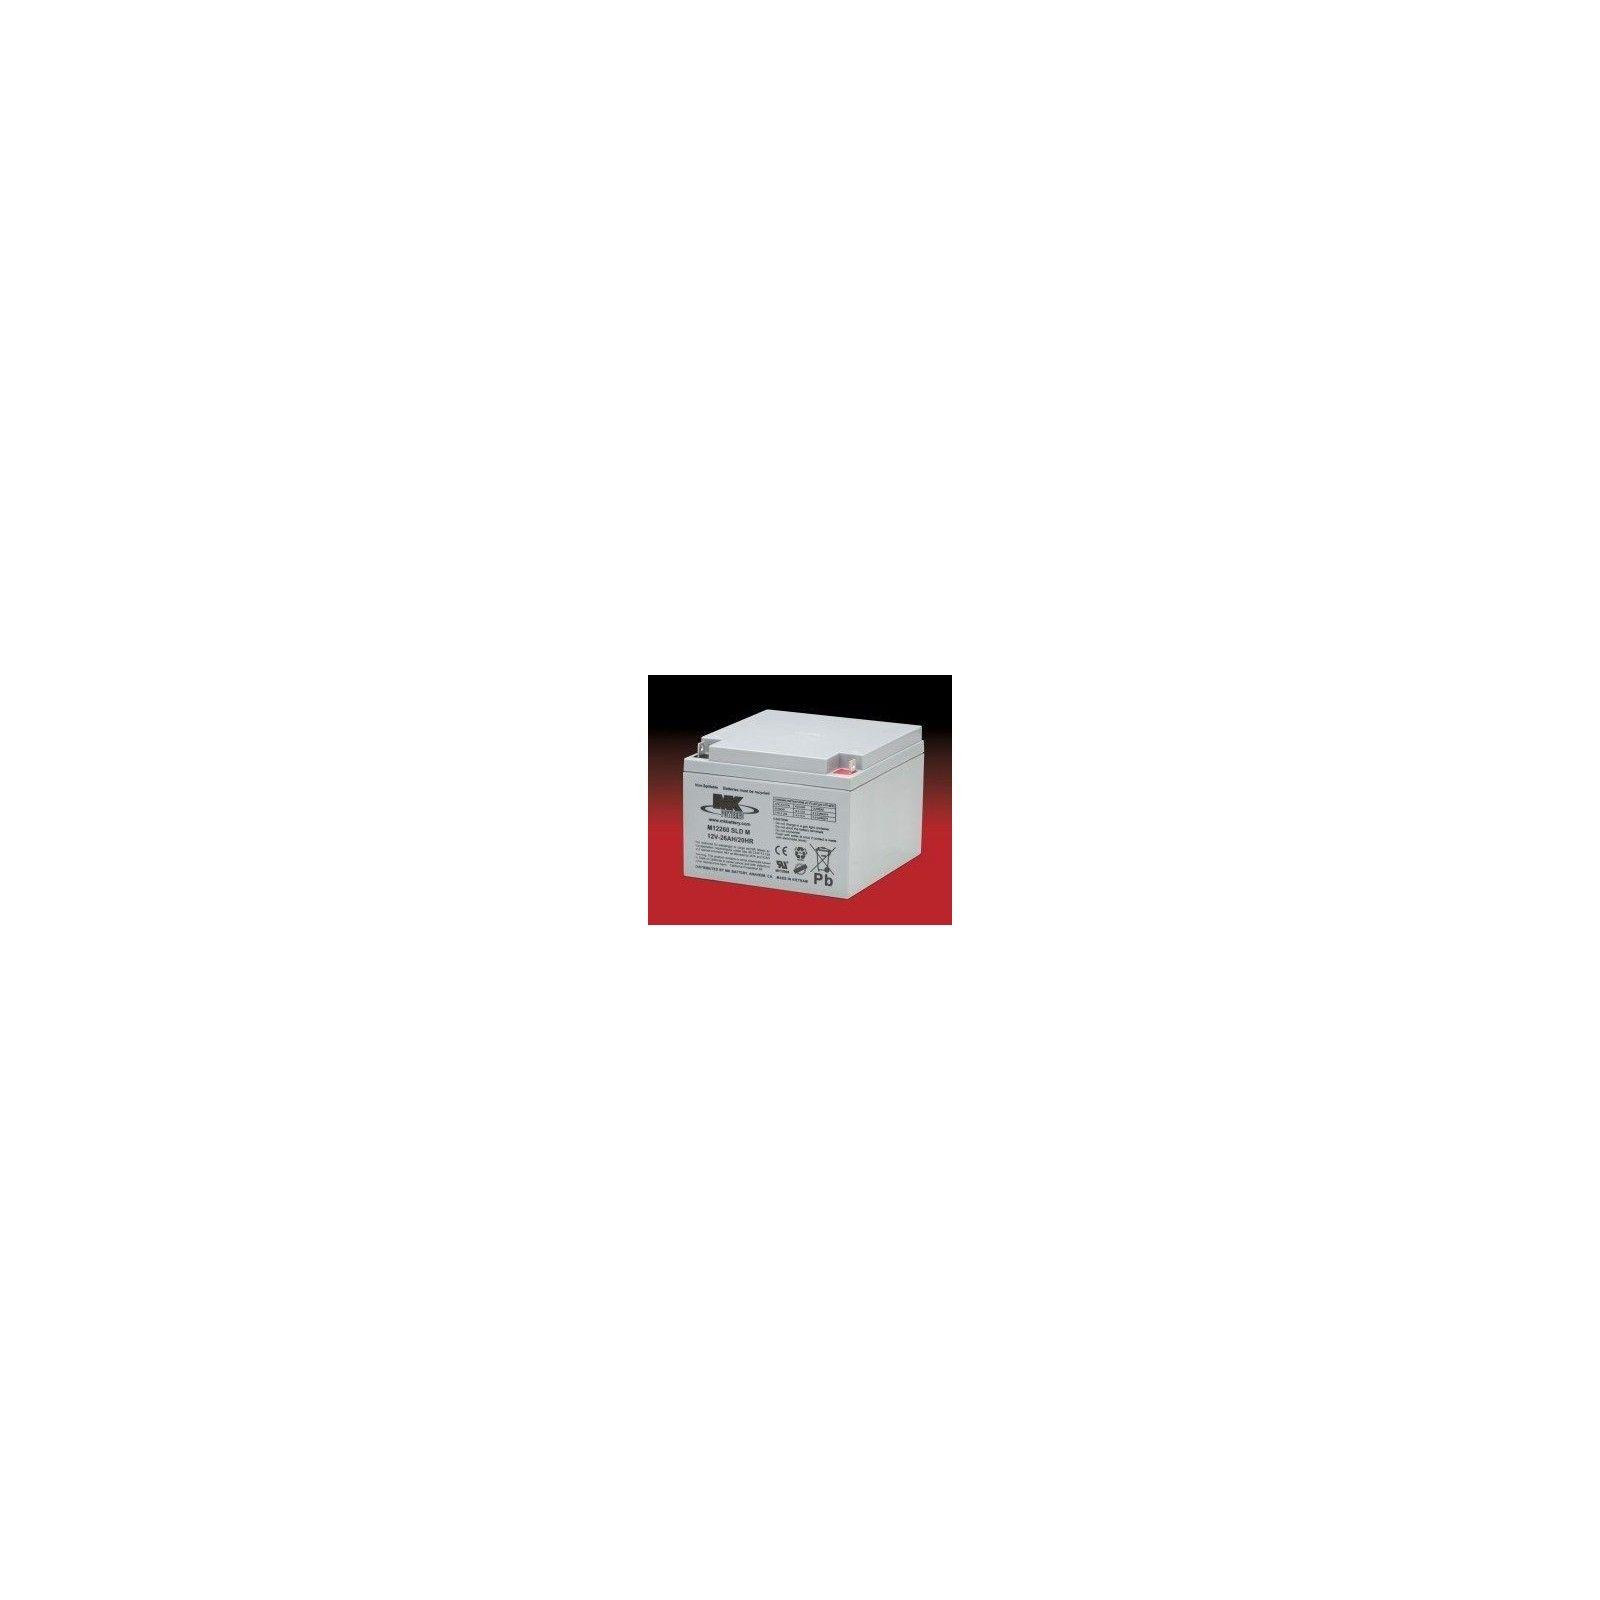 Batería MK ES26-12 26Ah 12V Agm MK - 1